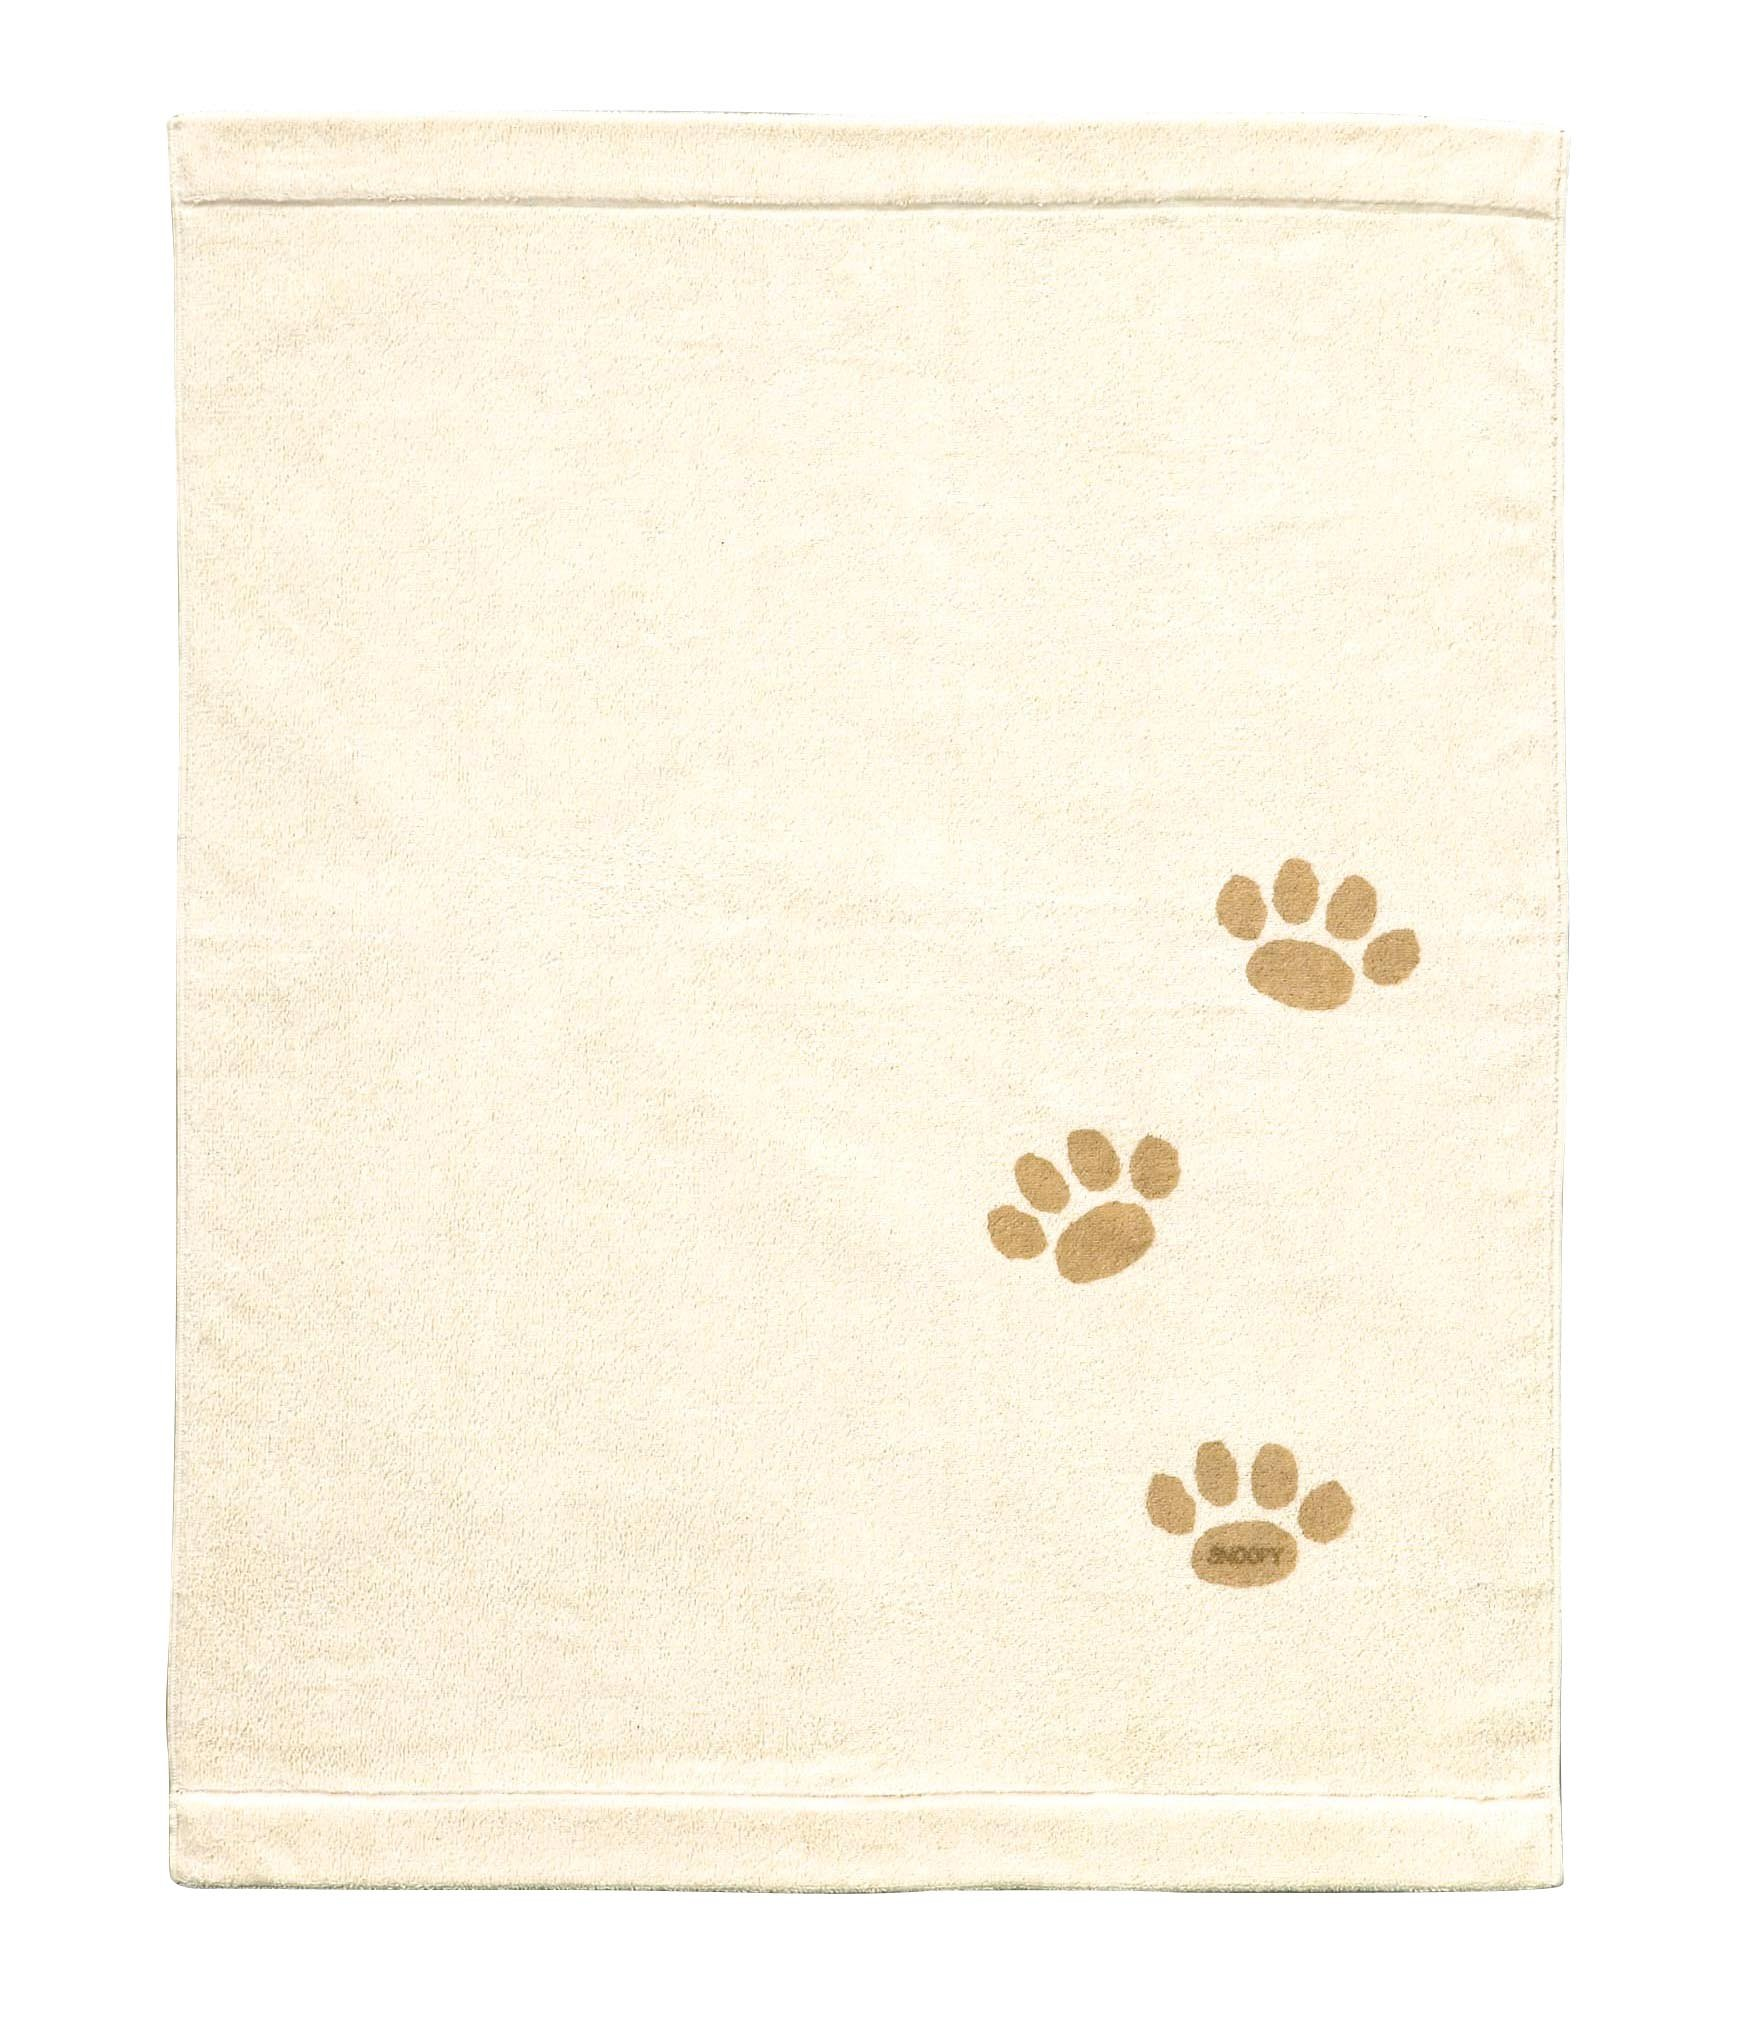 Nishikawa Living Snoopy Baby Organic cotton blanket 80 ~ 100cm Snoopy 2 by Nishikawa living